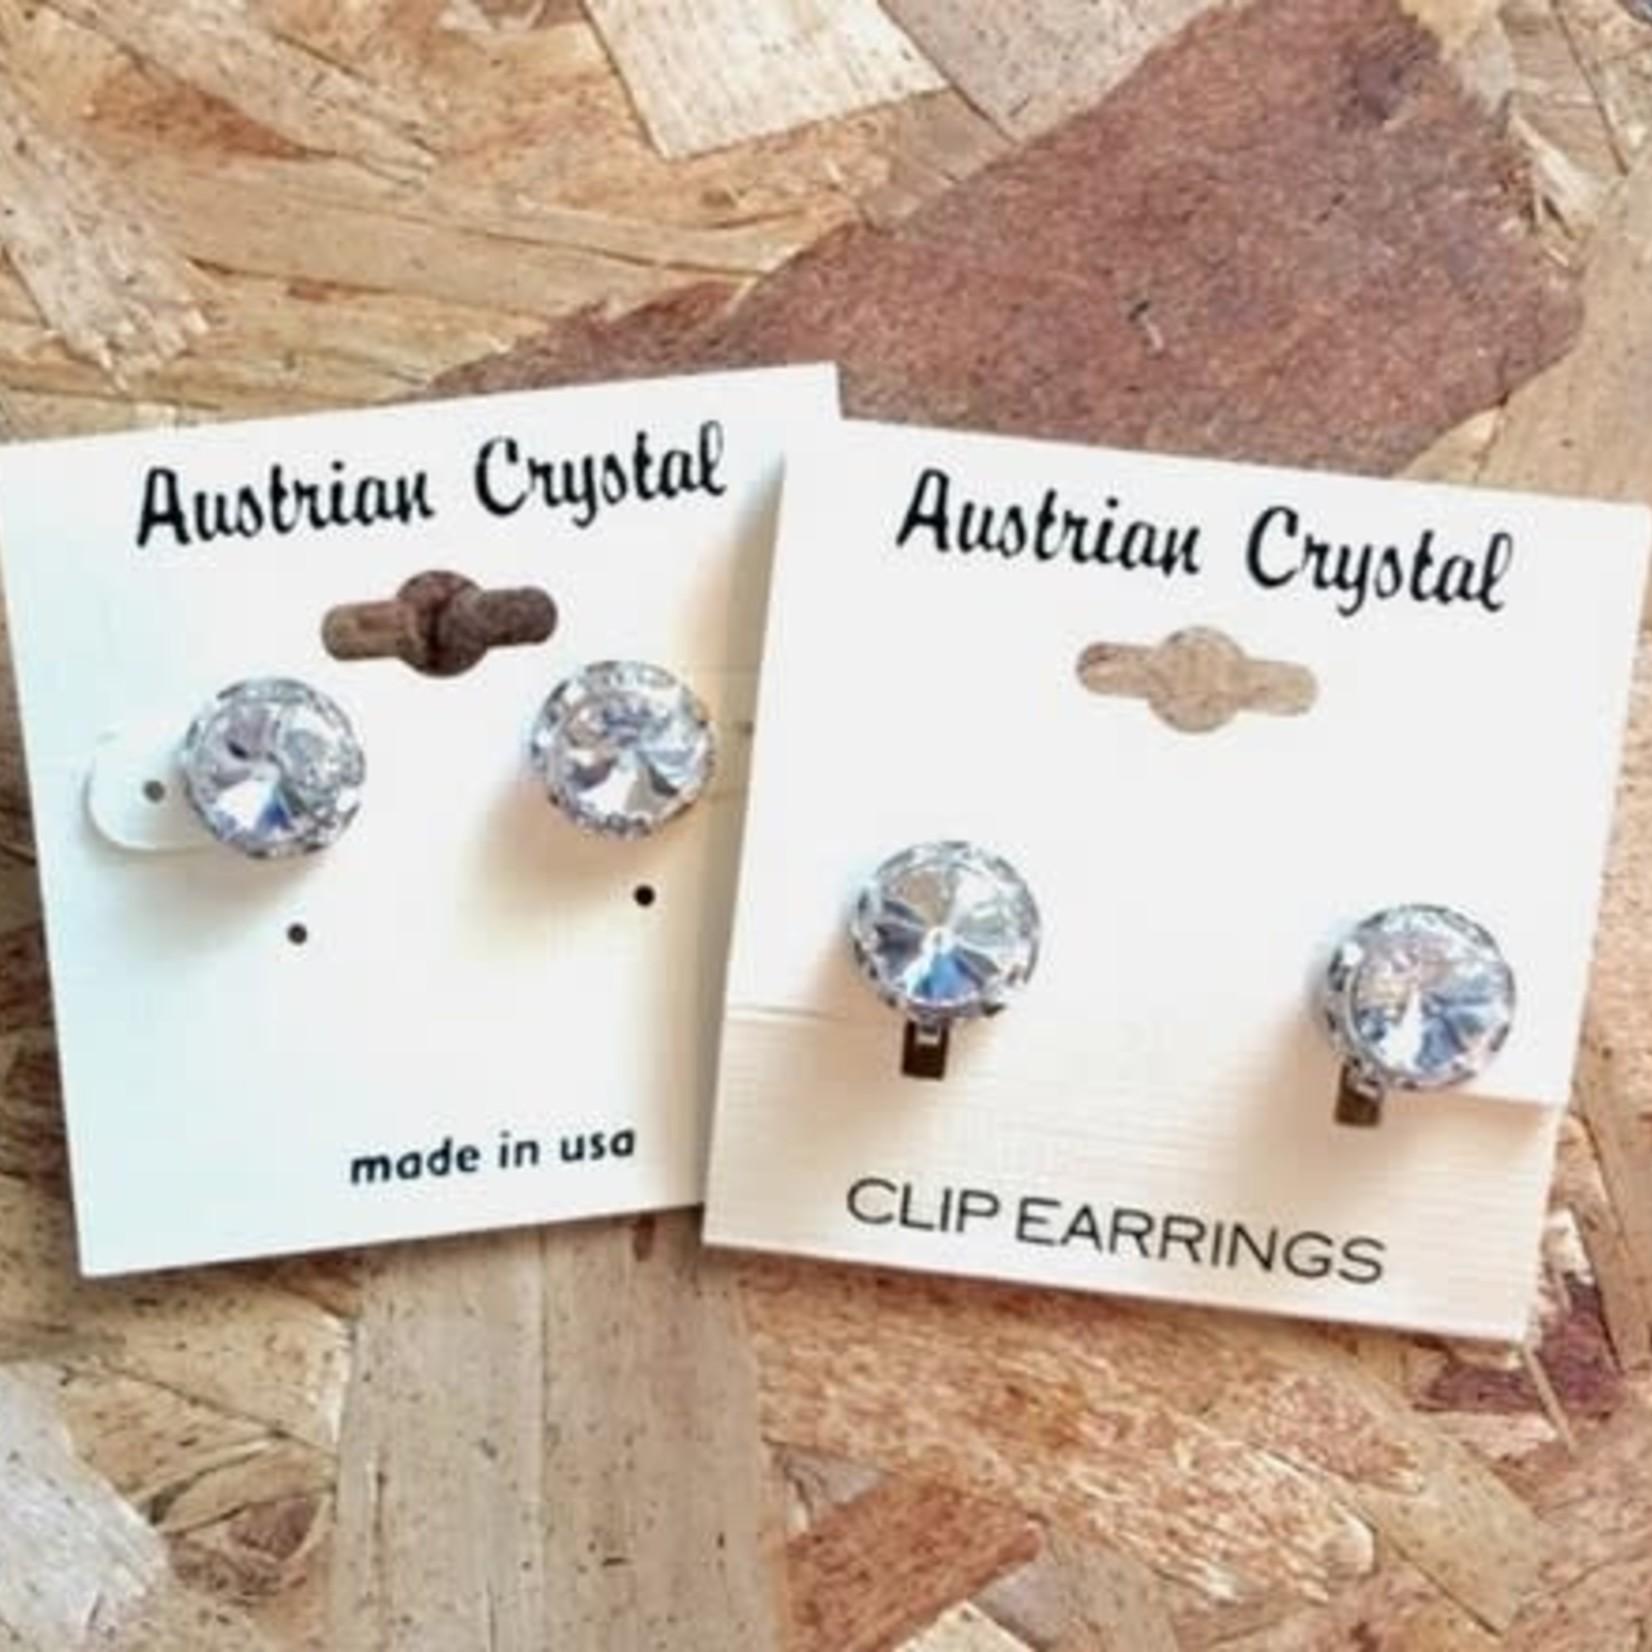 CJ Merchantile CJ Merchantile RA240 Australian Crystal 11mm Earrings